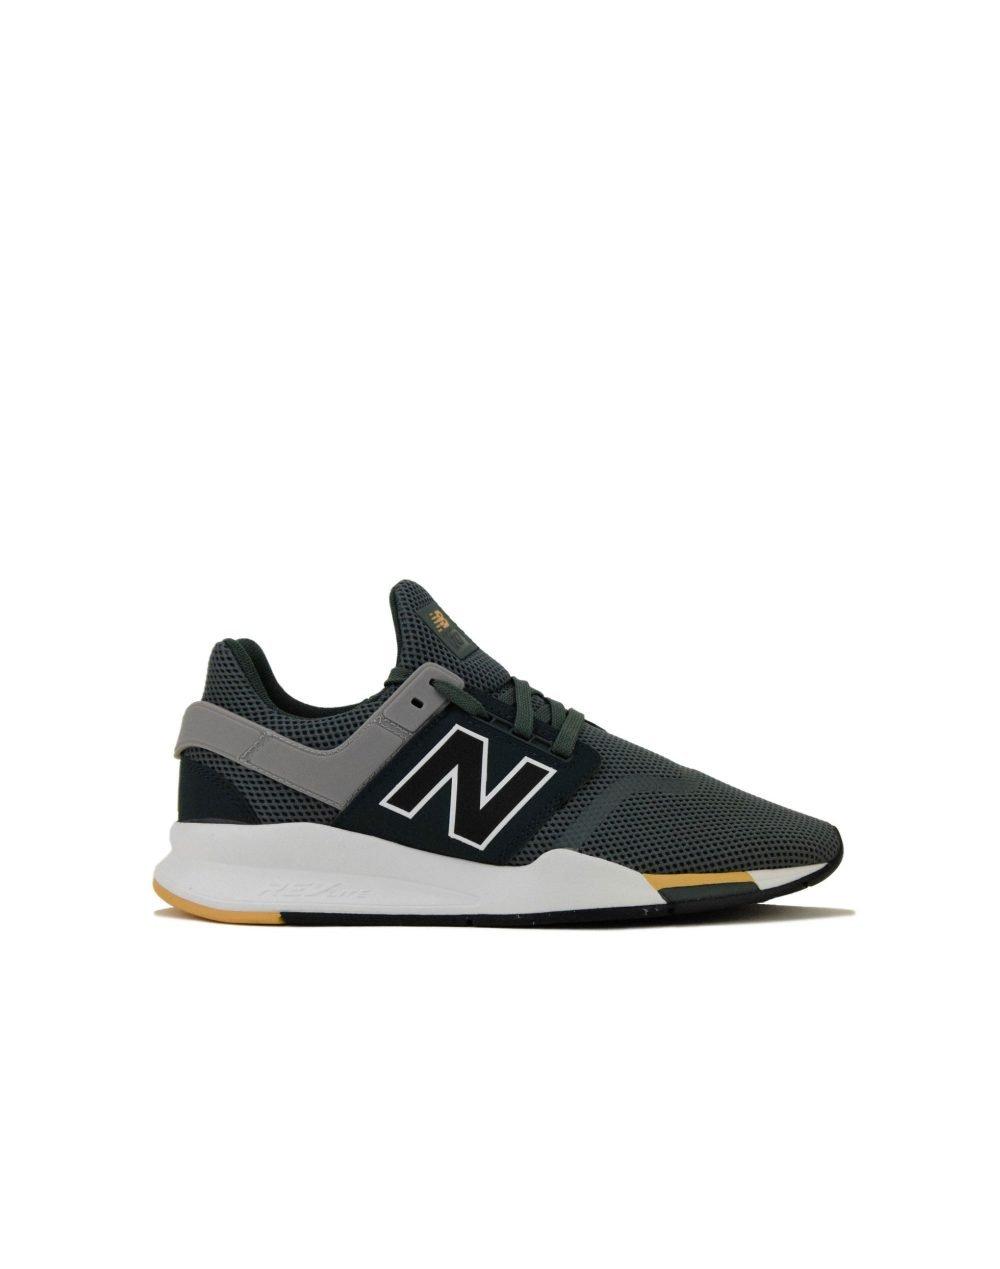 New Balance MS247FA Green